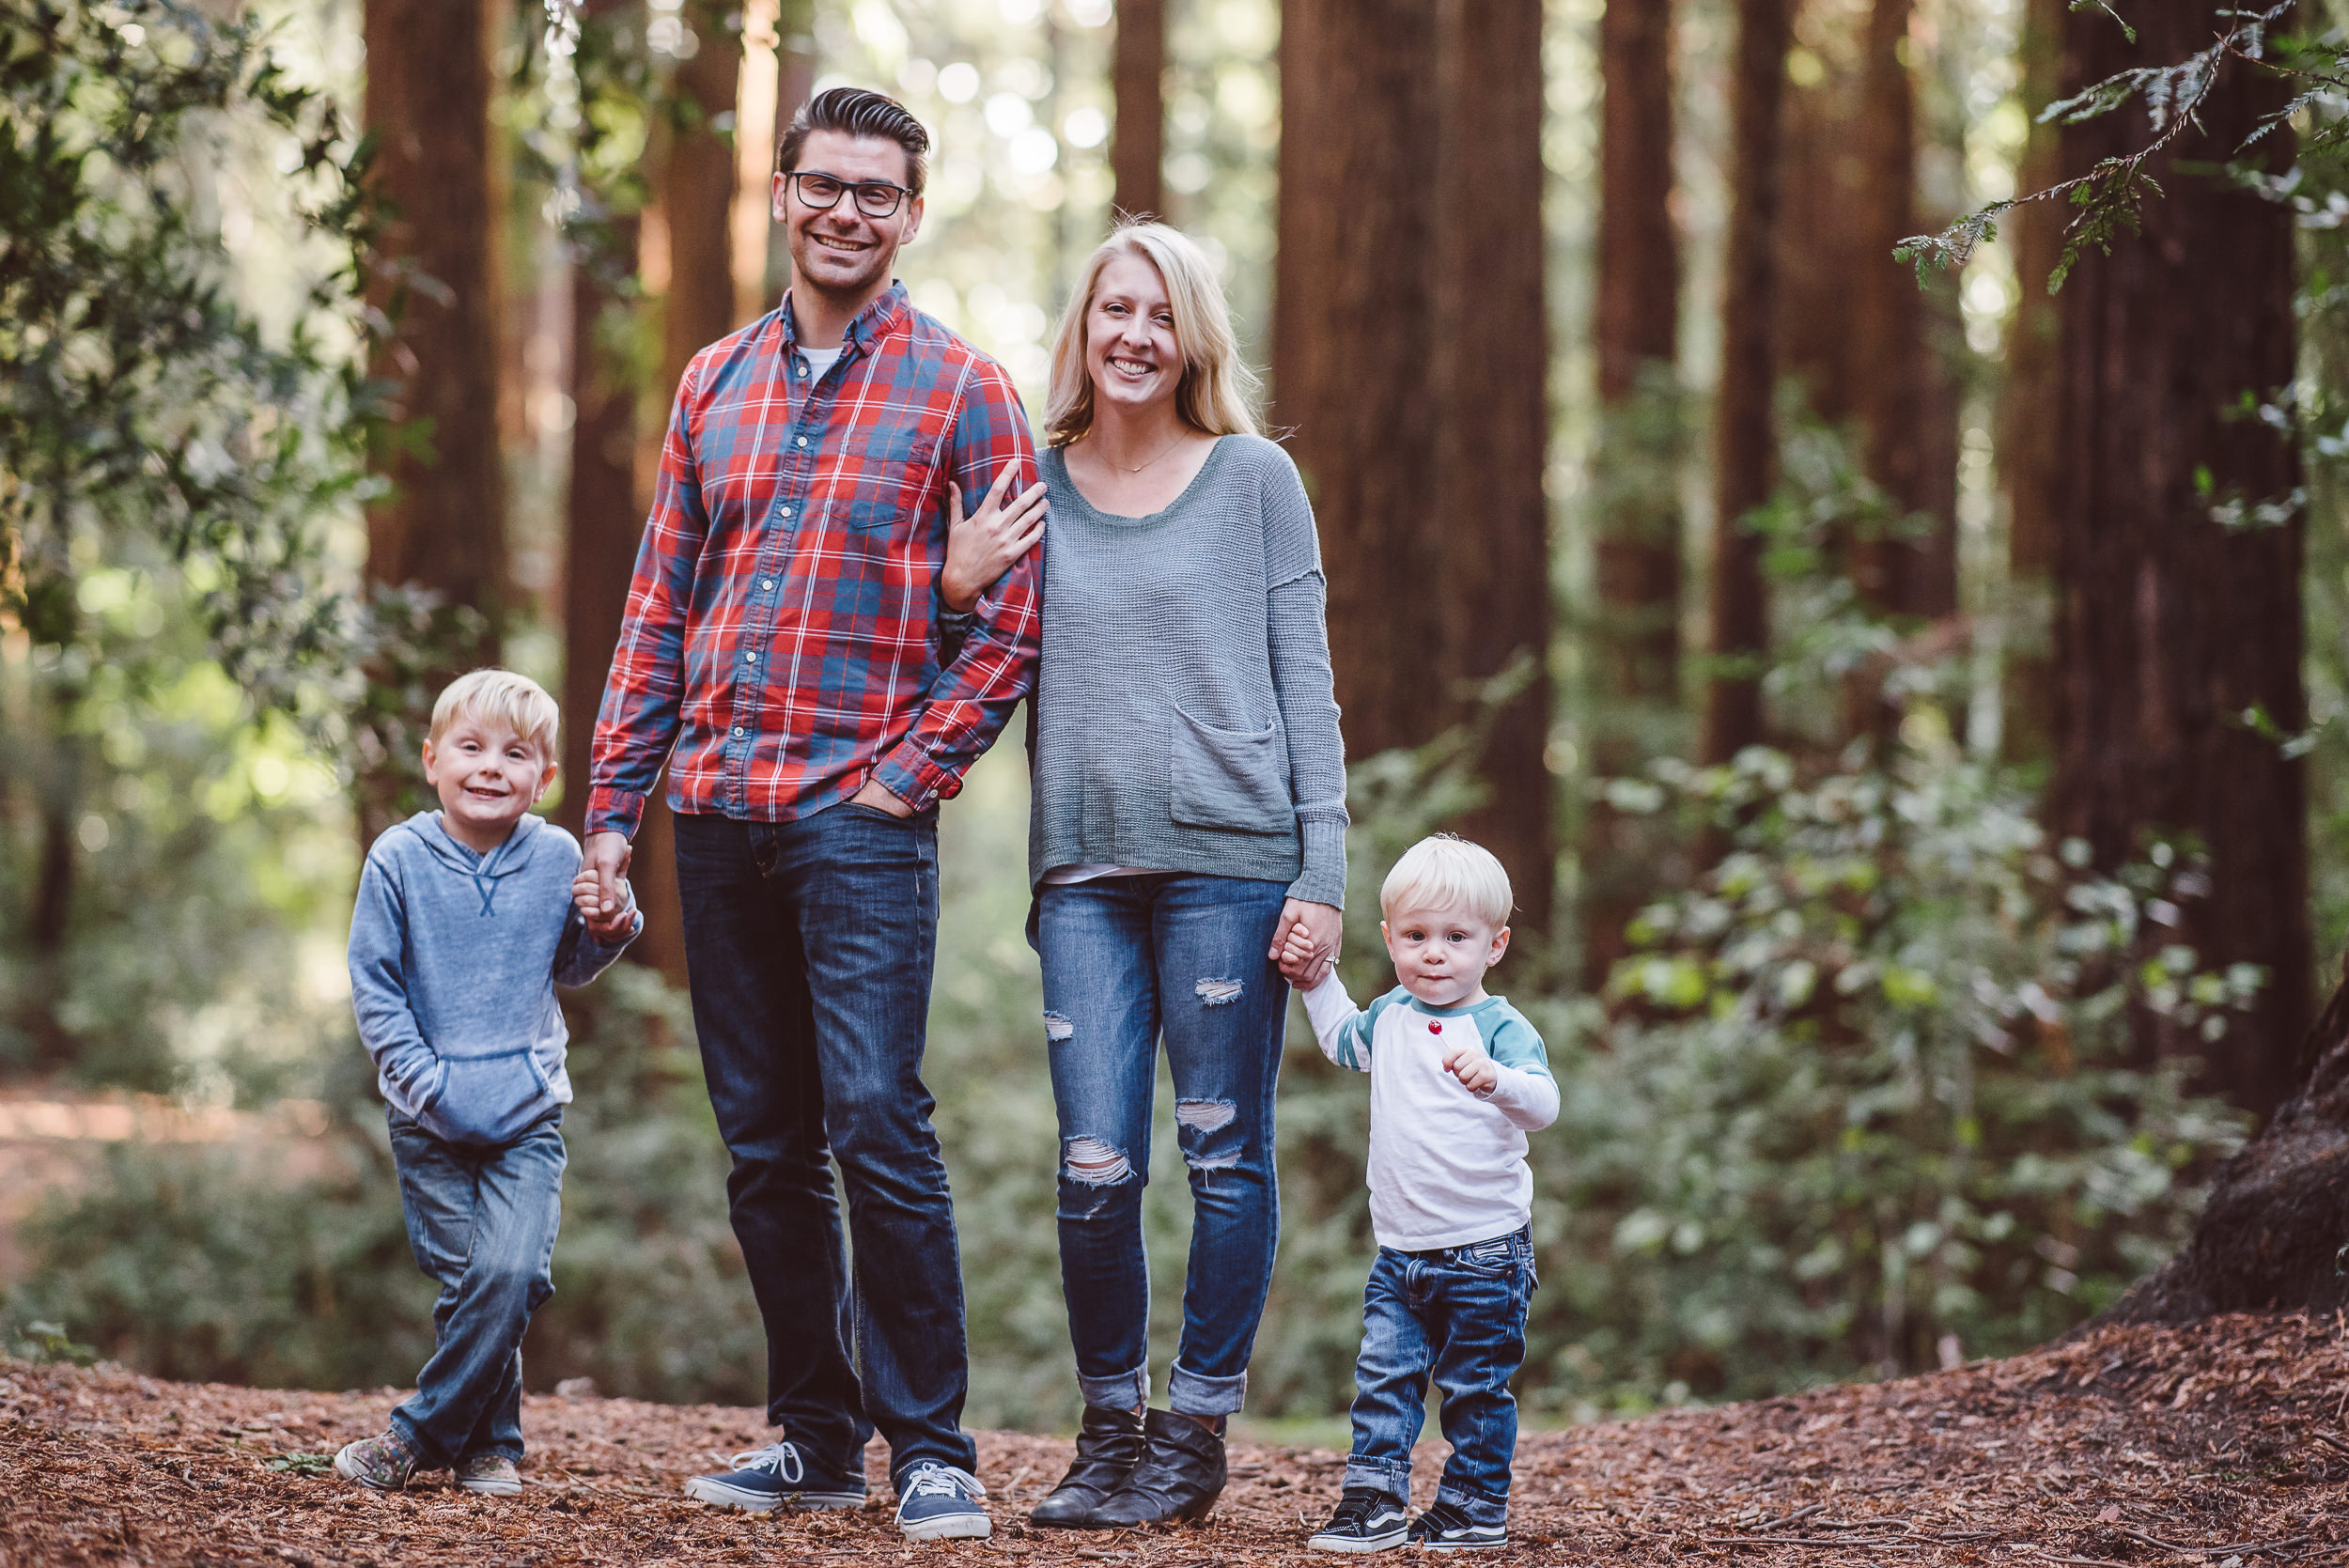 Joaquin-Miller-Park-Oakland-Family-Photography-013.jpg